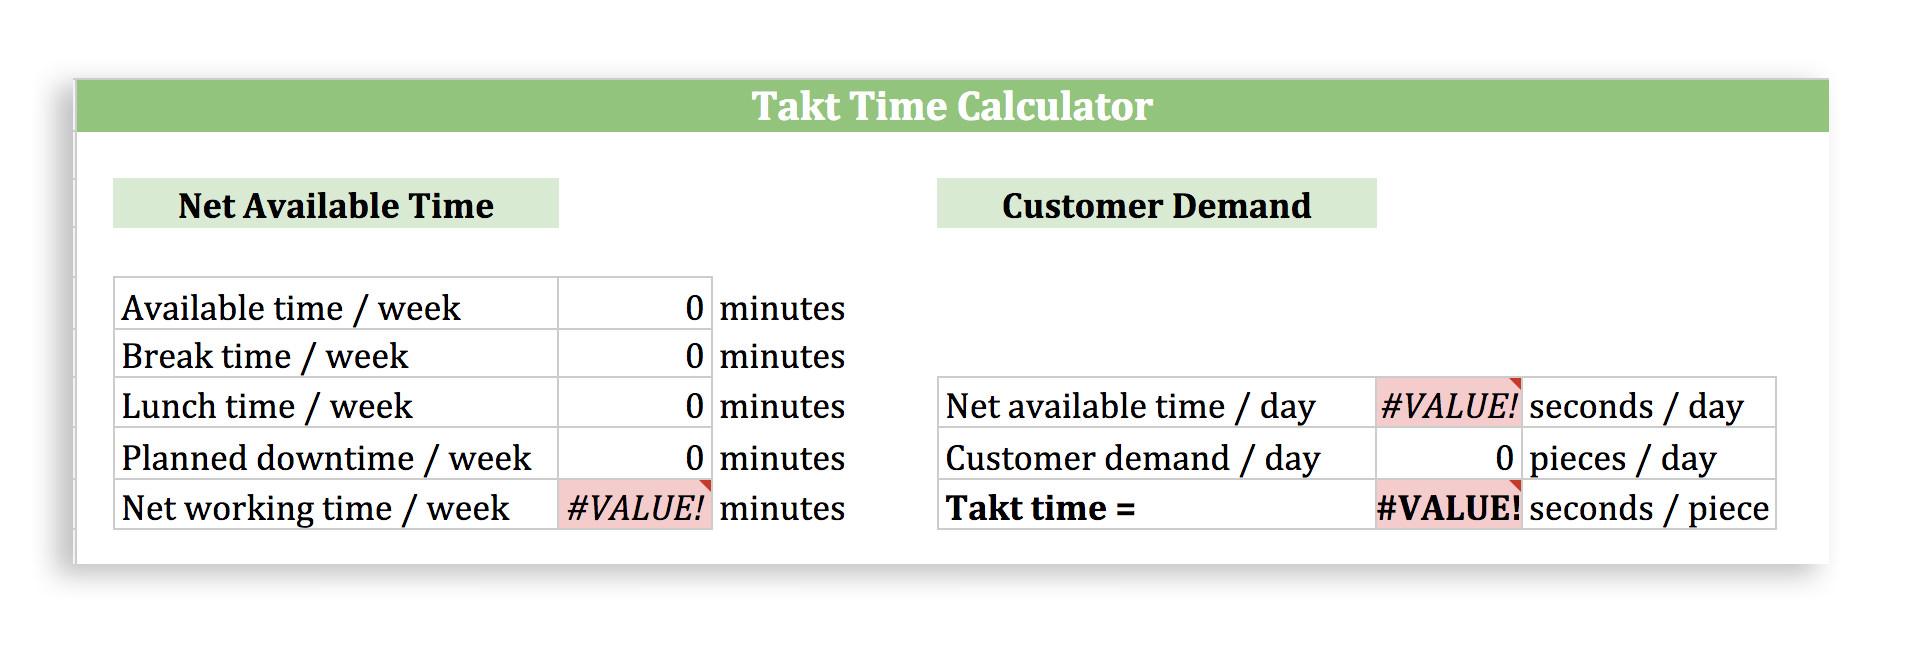 Takt Time Calculator